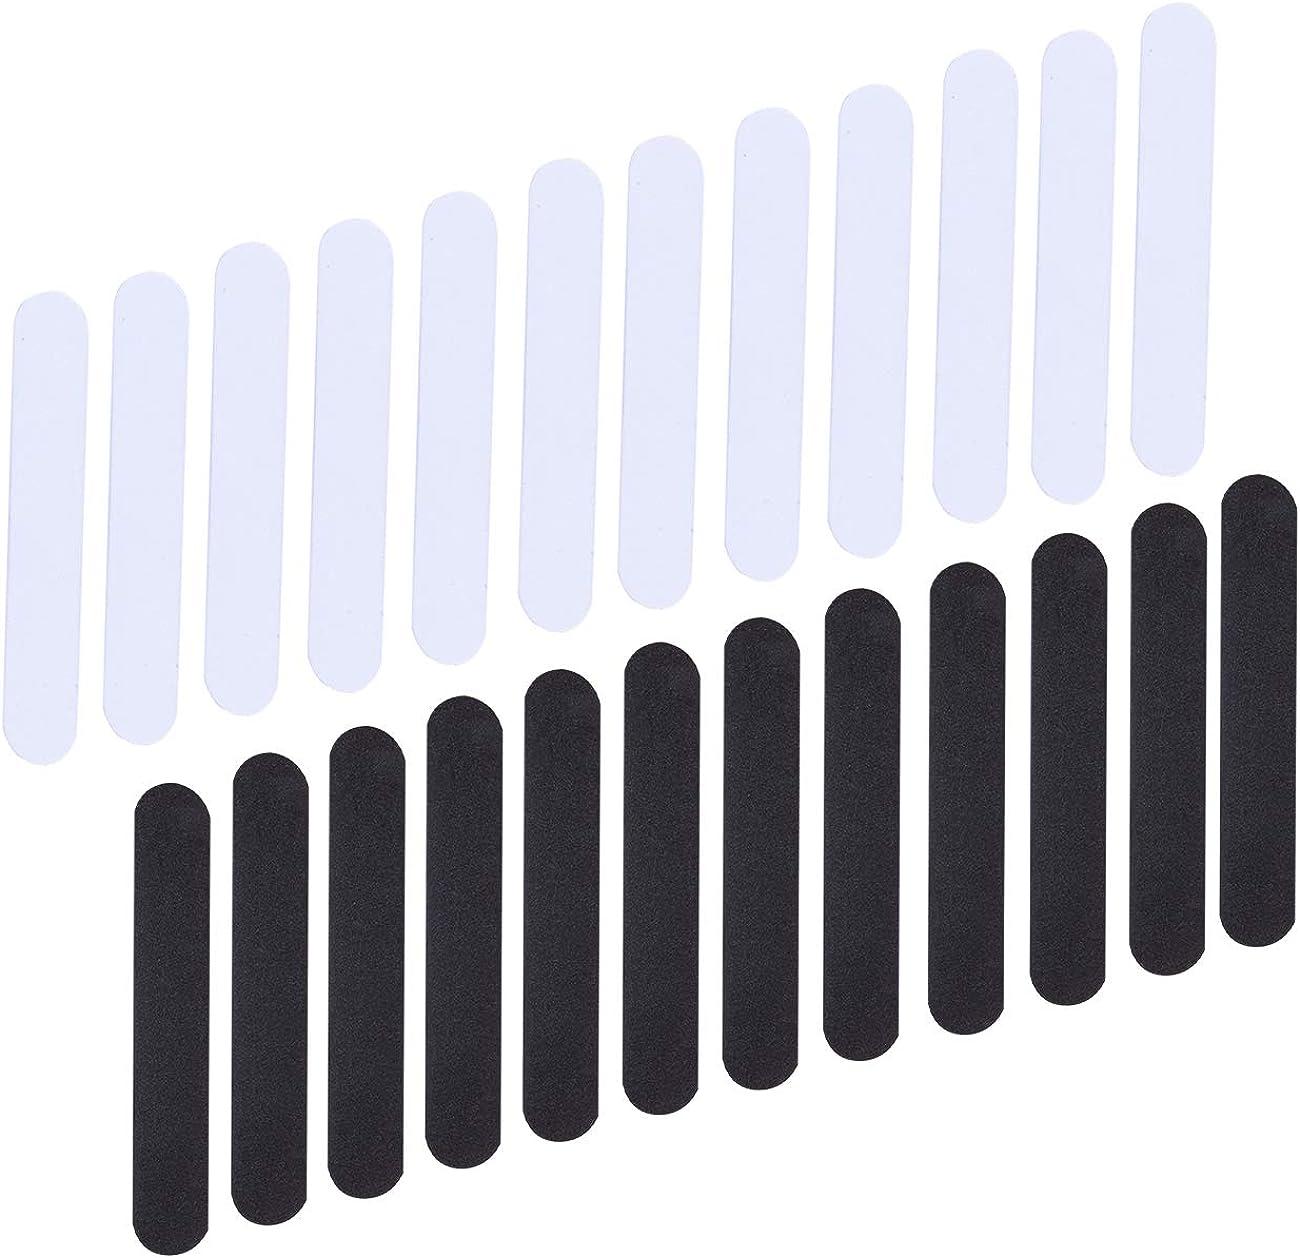 10pcs Hat Size Reducers Foam Reducing Tape Cap Sweat Band Insert Sweat Liner